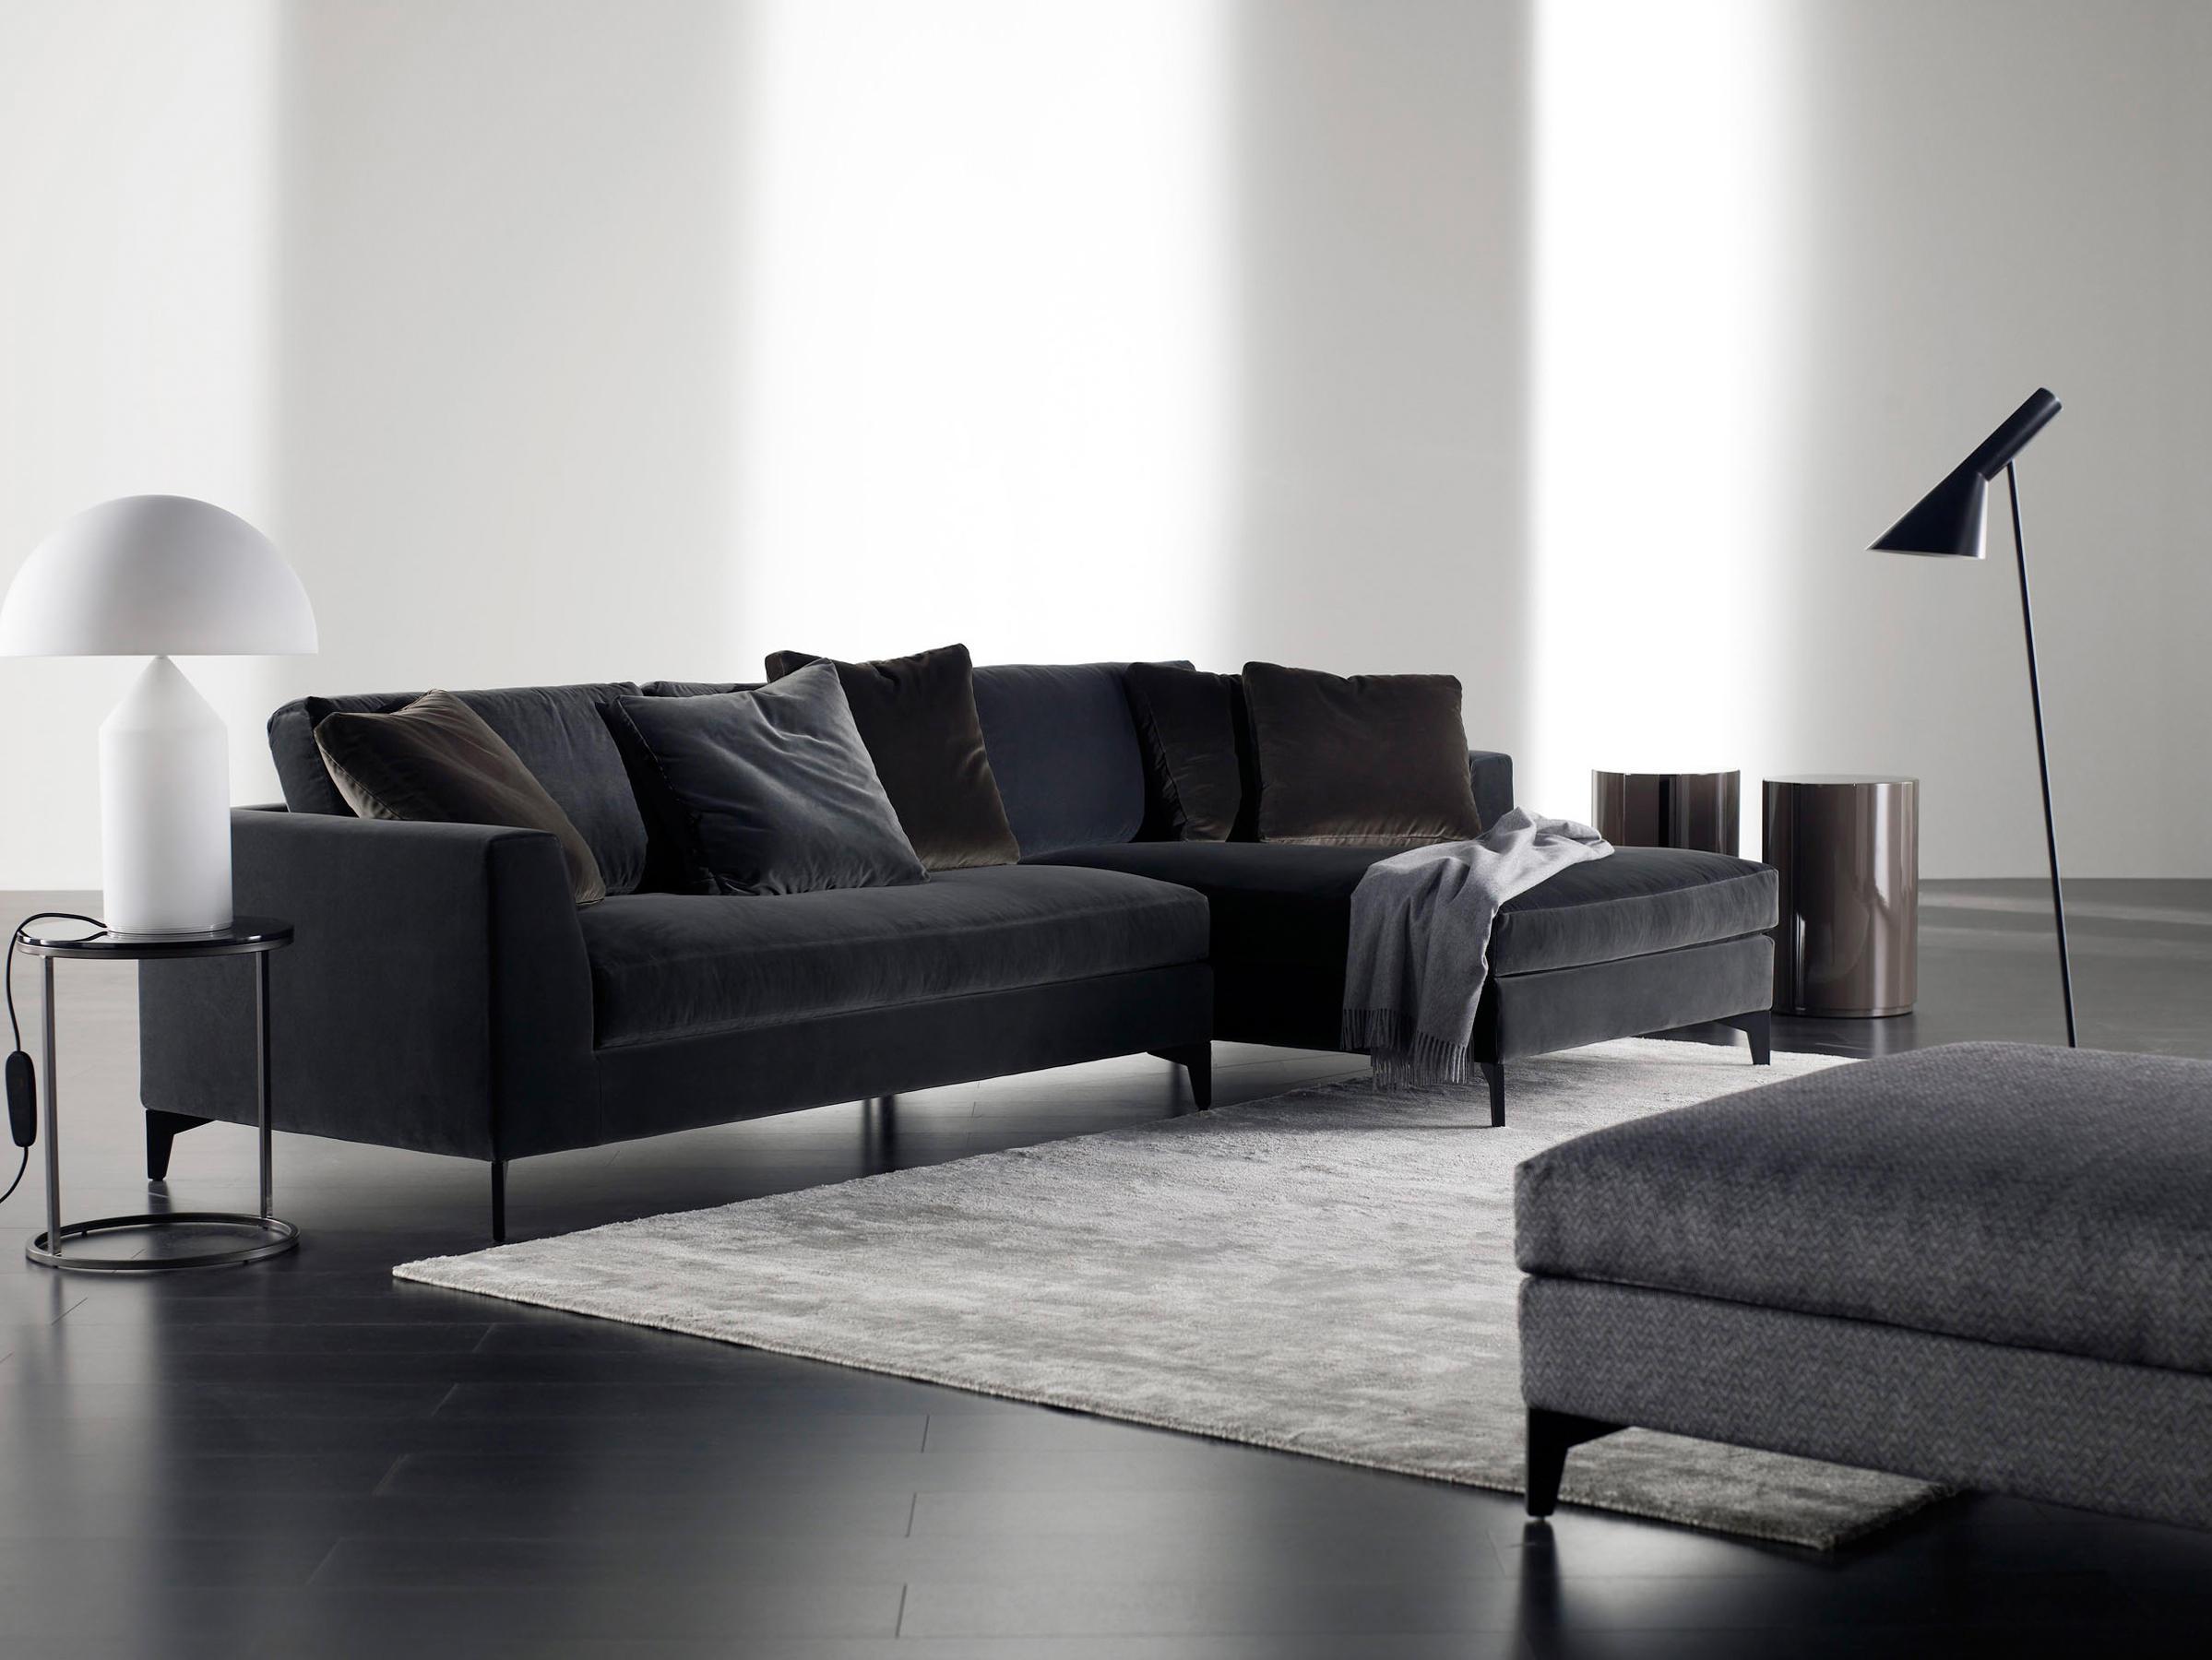 louis up canap modulables canap s modulaires de. Black Bedroom Furniture Sets. Home Design Ideas